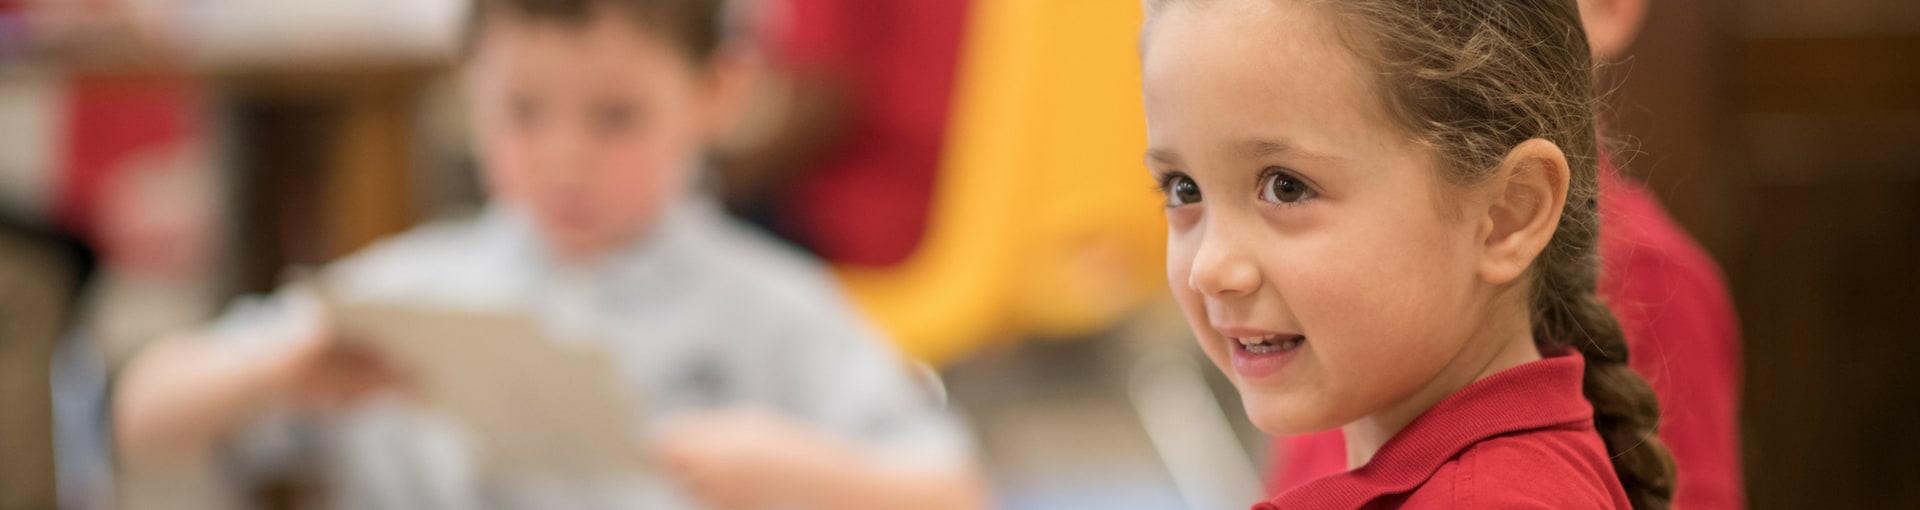 Private Christian Kindergarten in Lancaster, PA